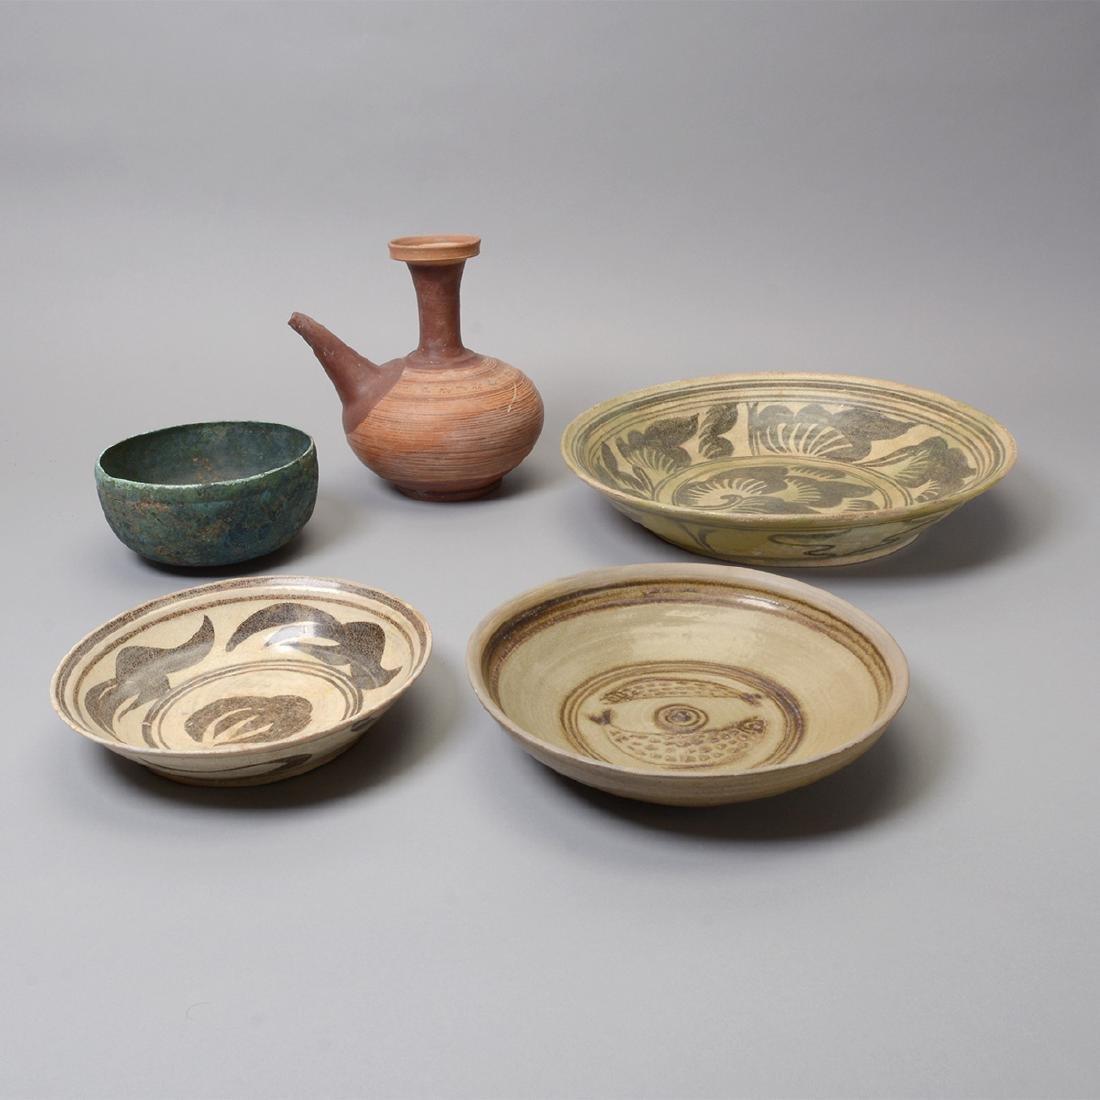 Large Group of Thai Glazed Ceramics, 7th - 16th C